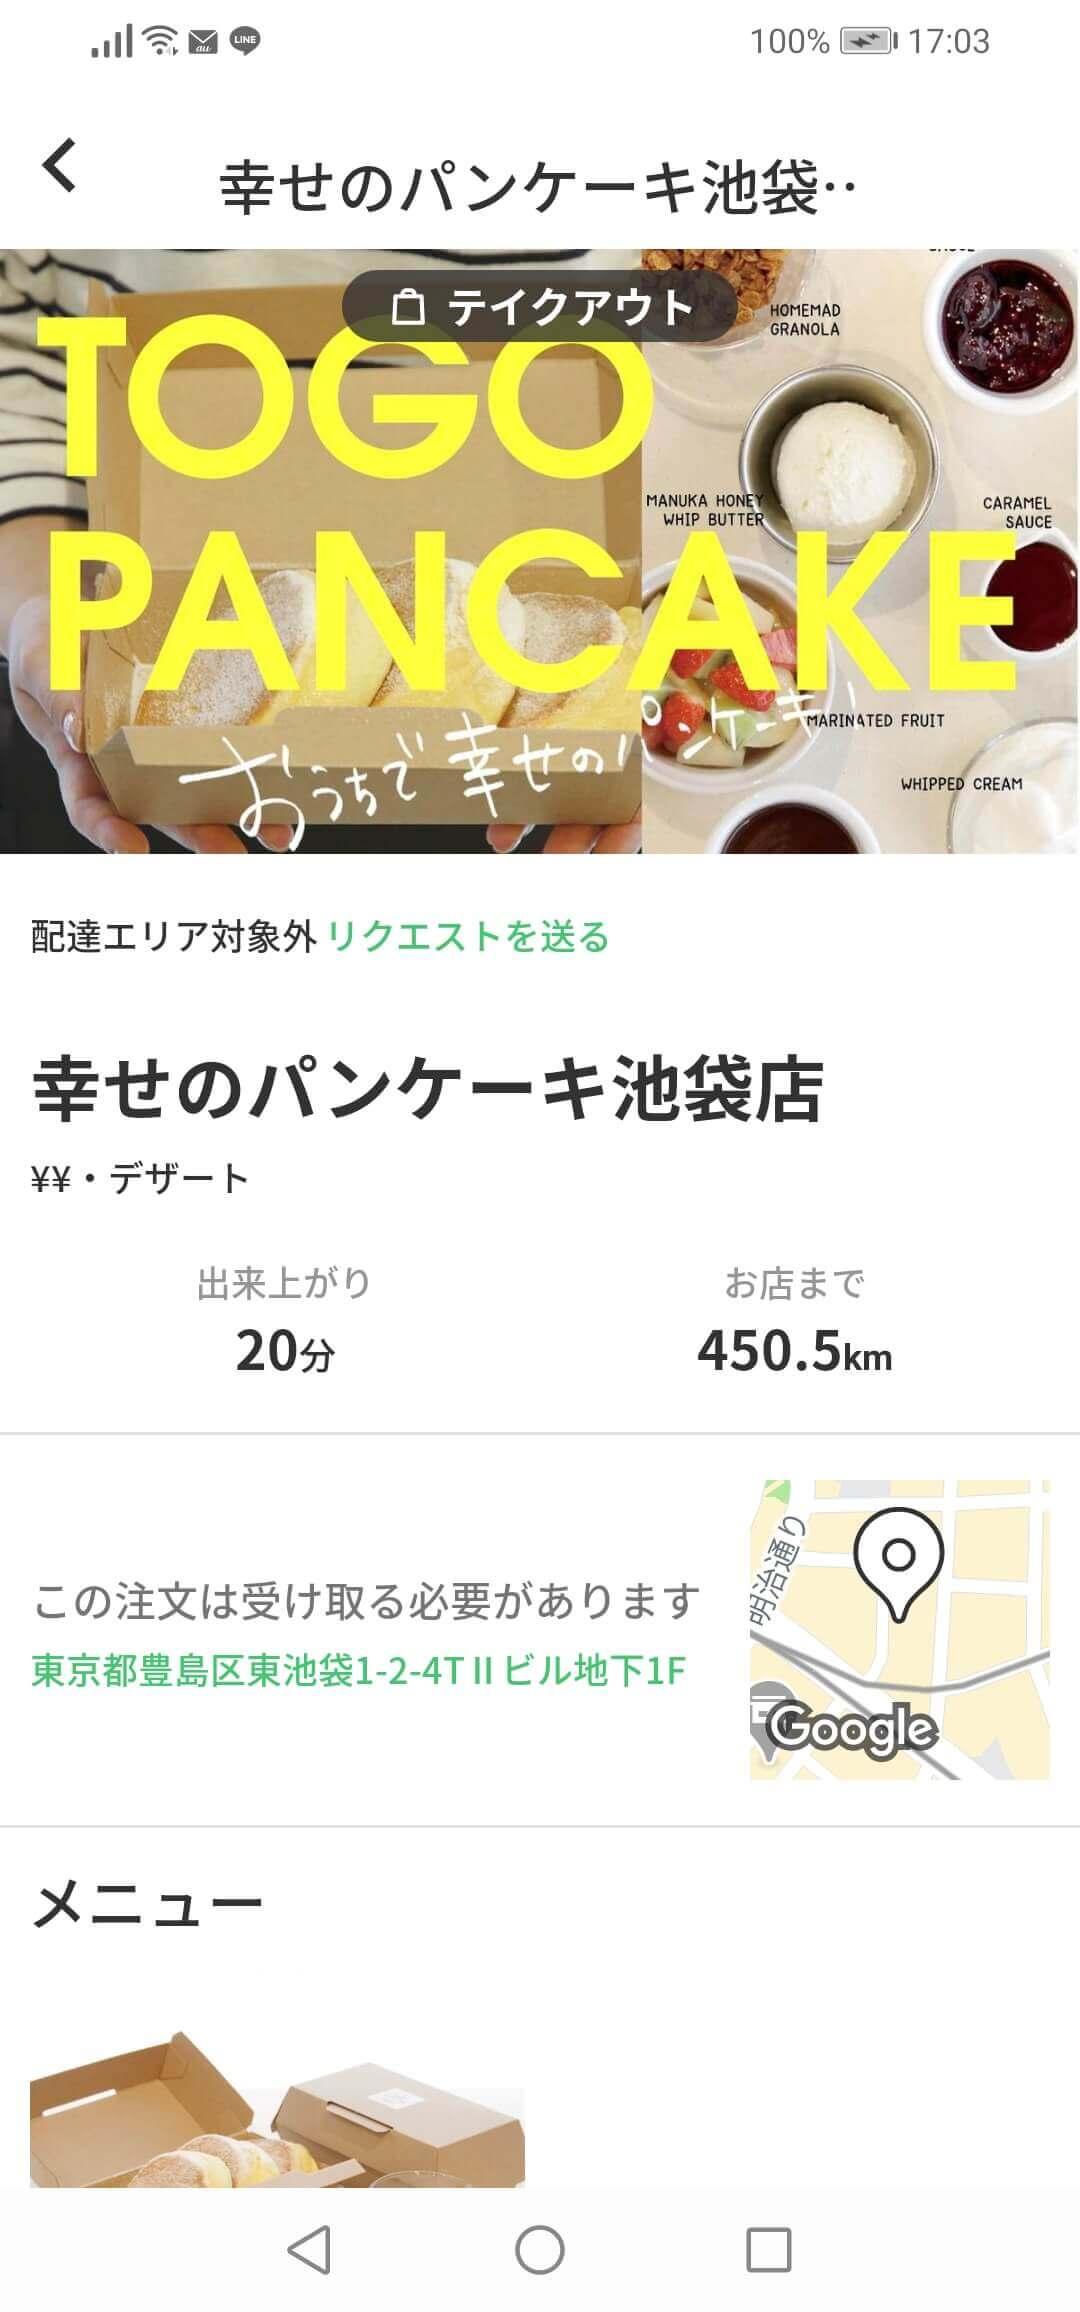 menu(メニュー)東京都内のおすすめ店舗・スイーツ【幸せのパンケーキ 池袋店】